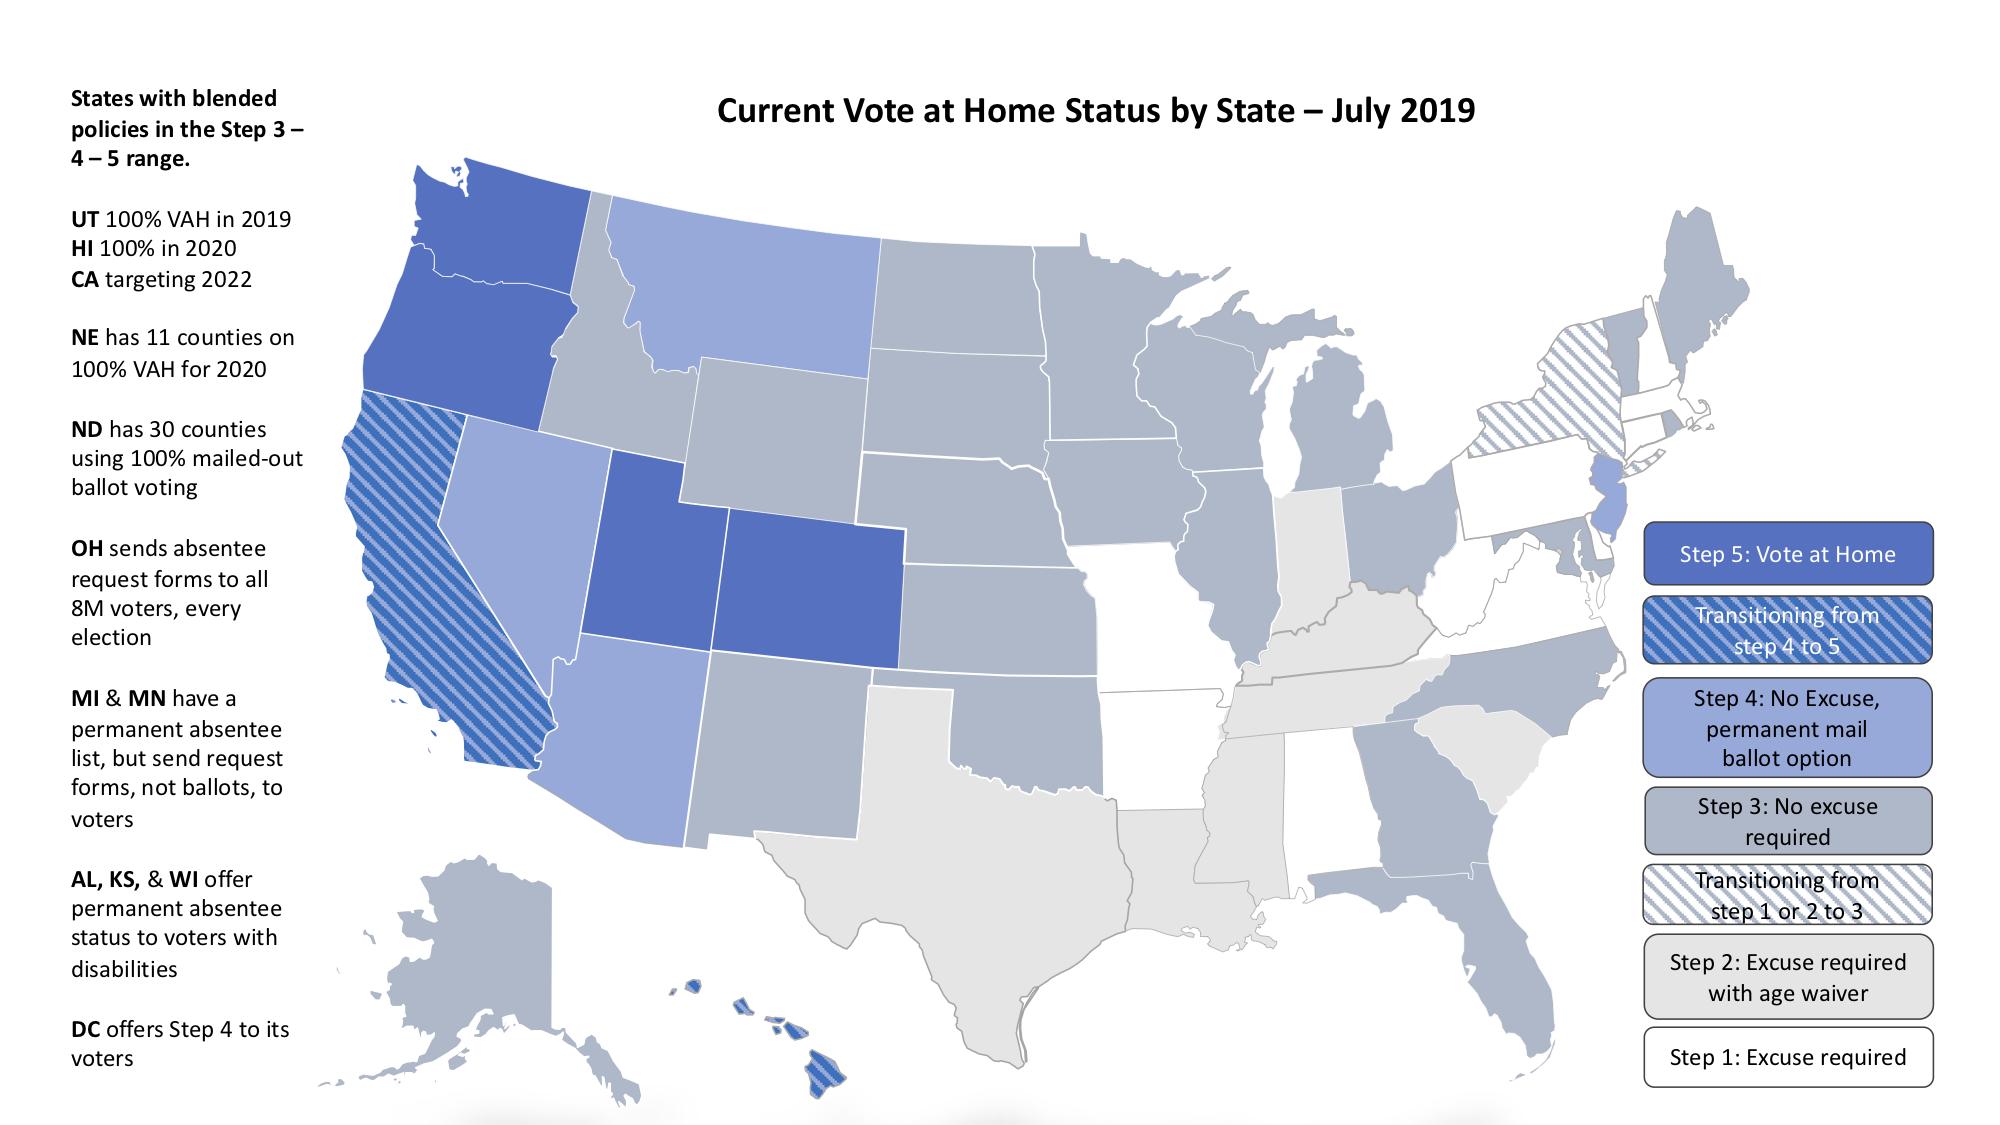 voteathome.org